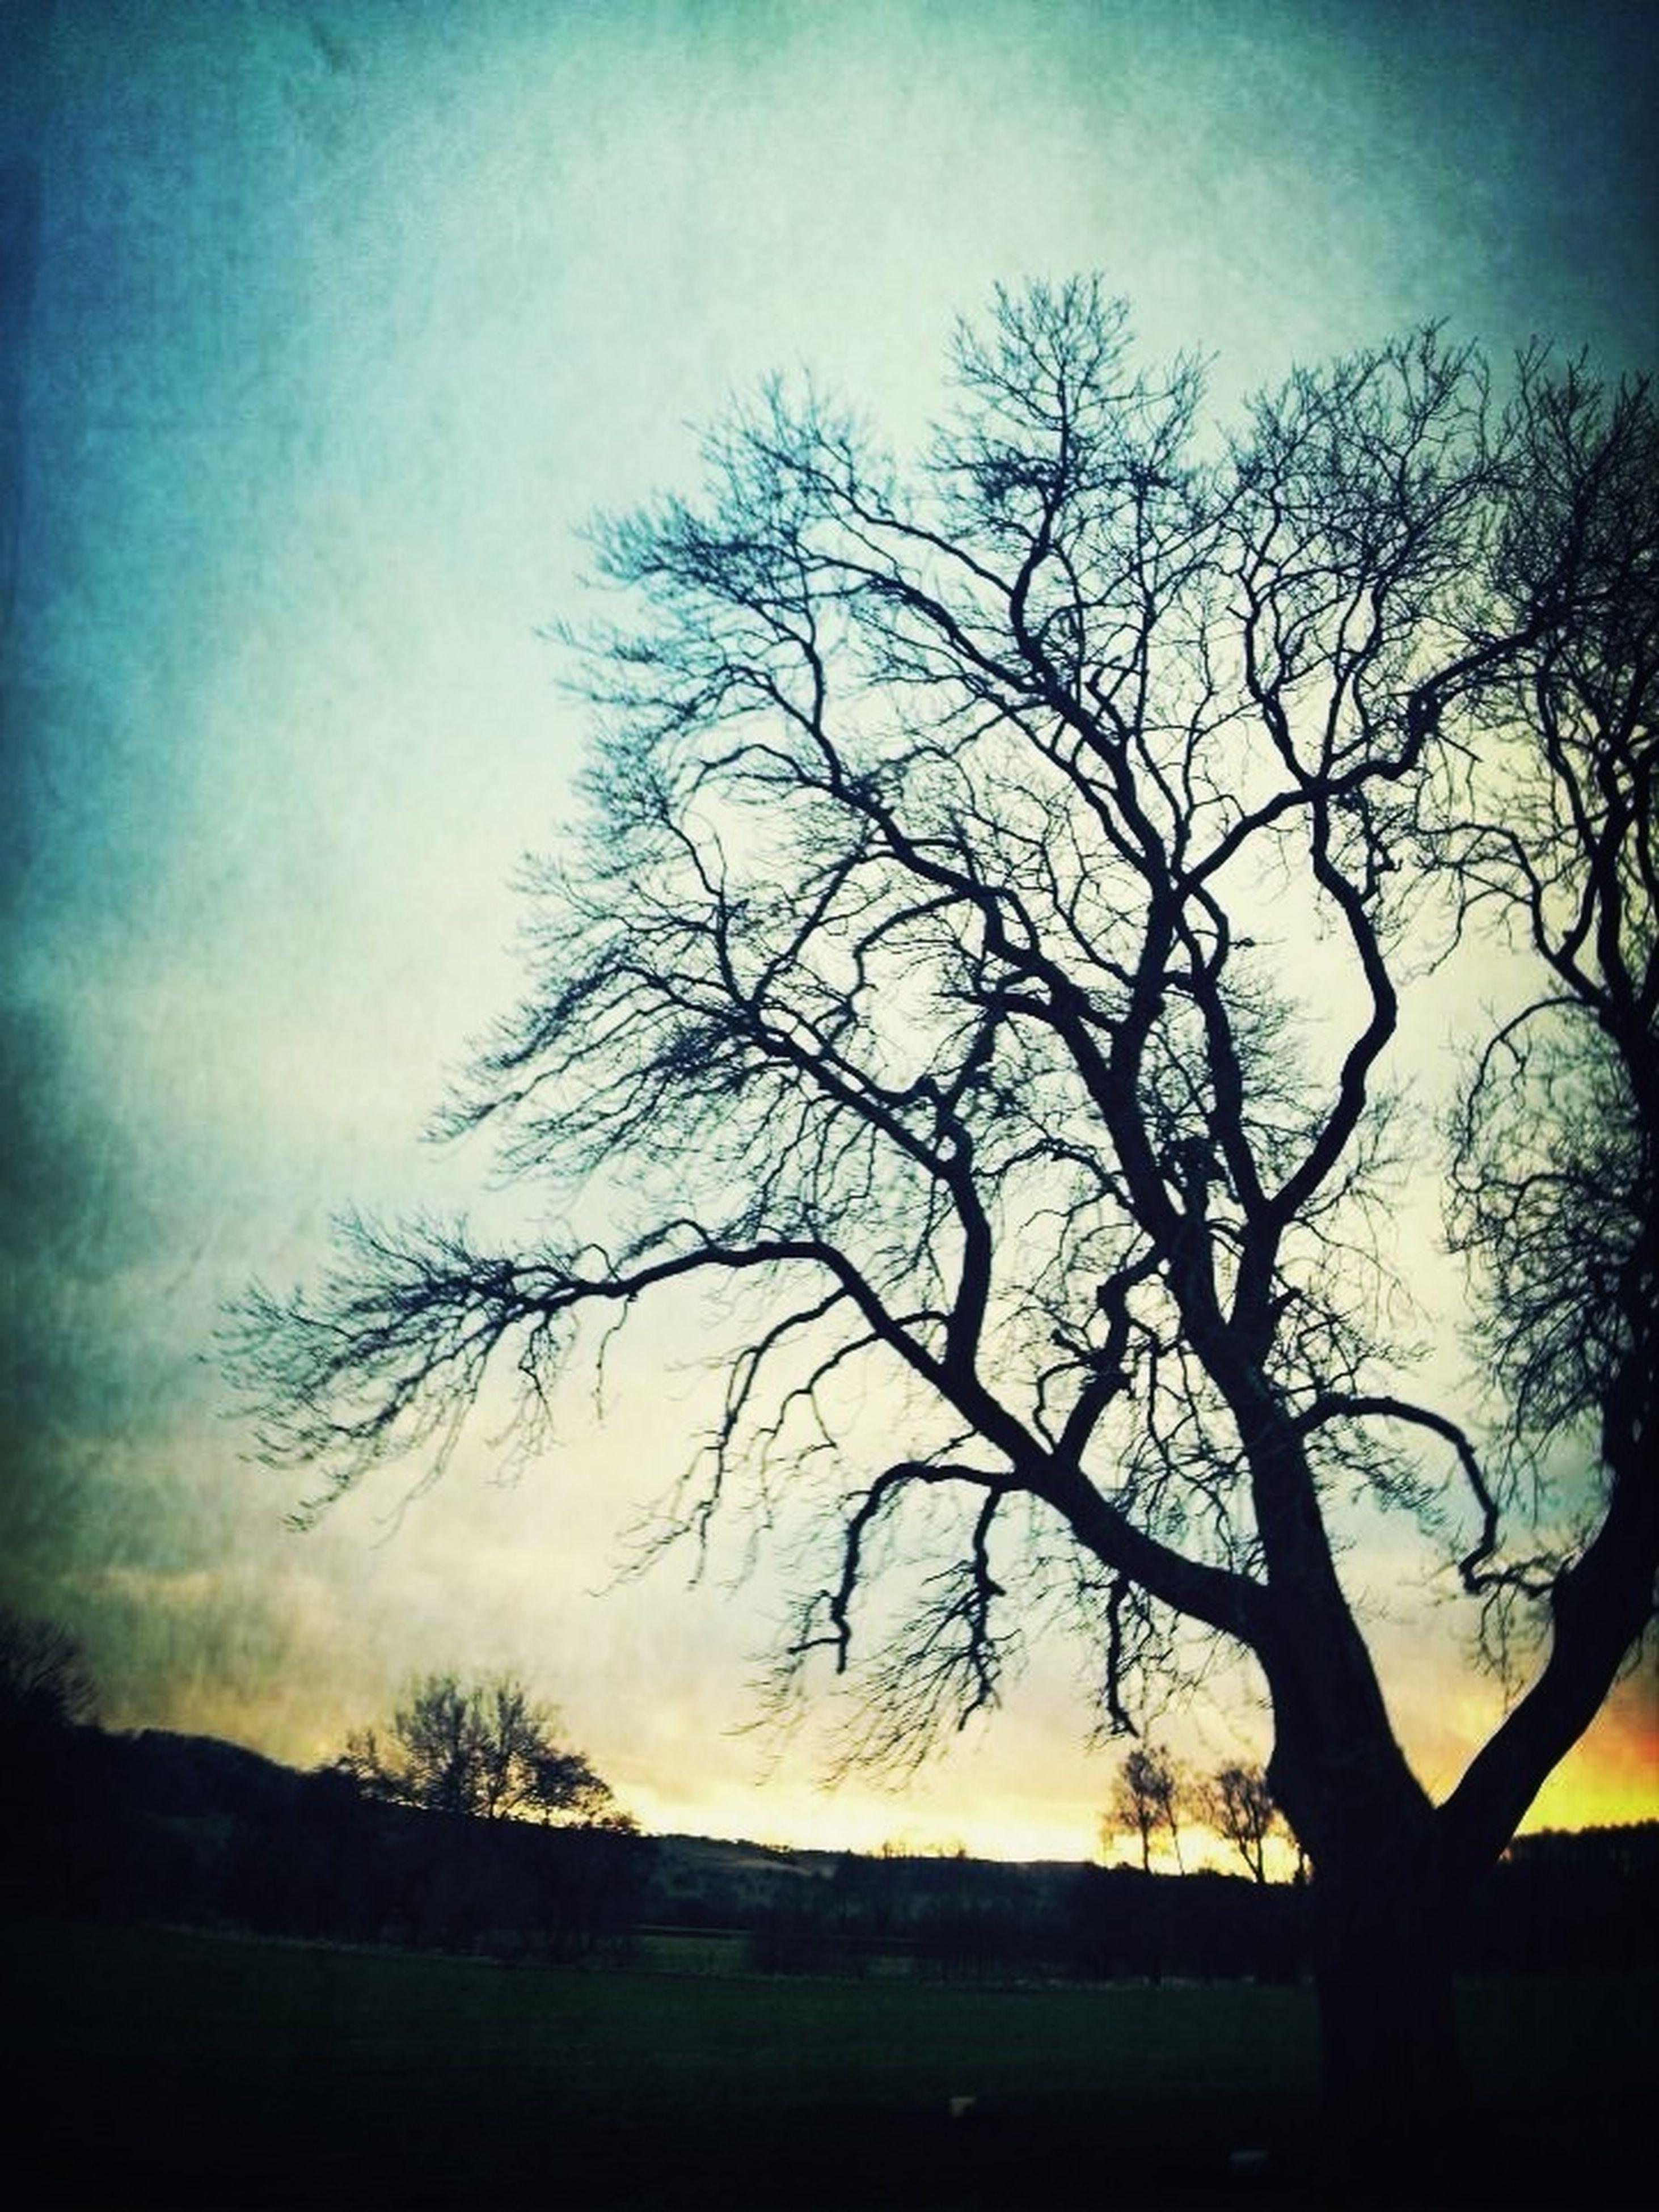 bare tree, tree, silhouette, tranquility, tranquil scene, scenics, sky, beauty in nature, branch, nature, landscape, sunset, water, non-urban scene, dusk, idyllic, field, outdoors, lake, non urban scene